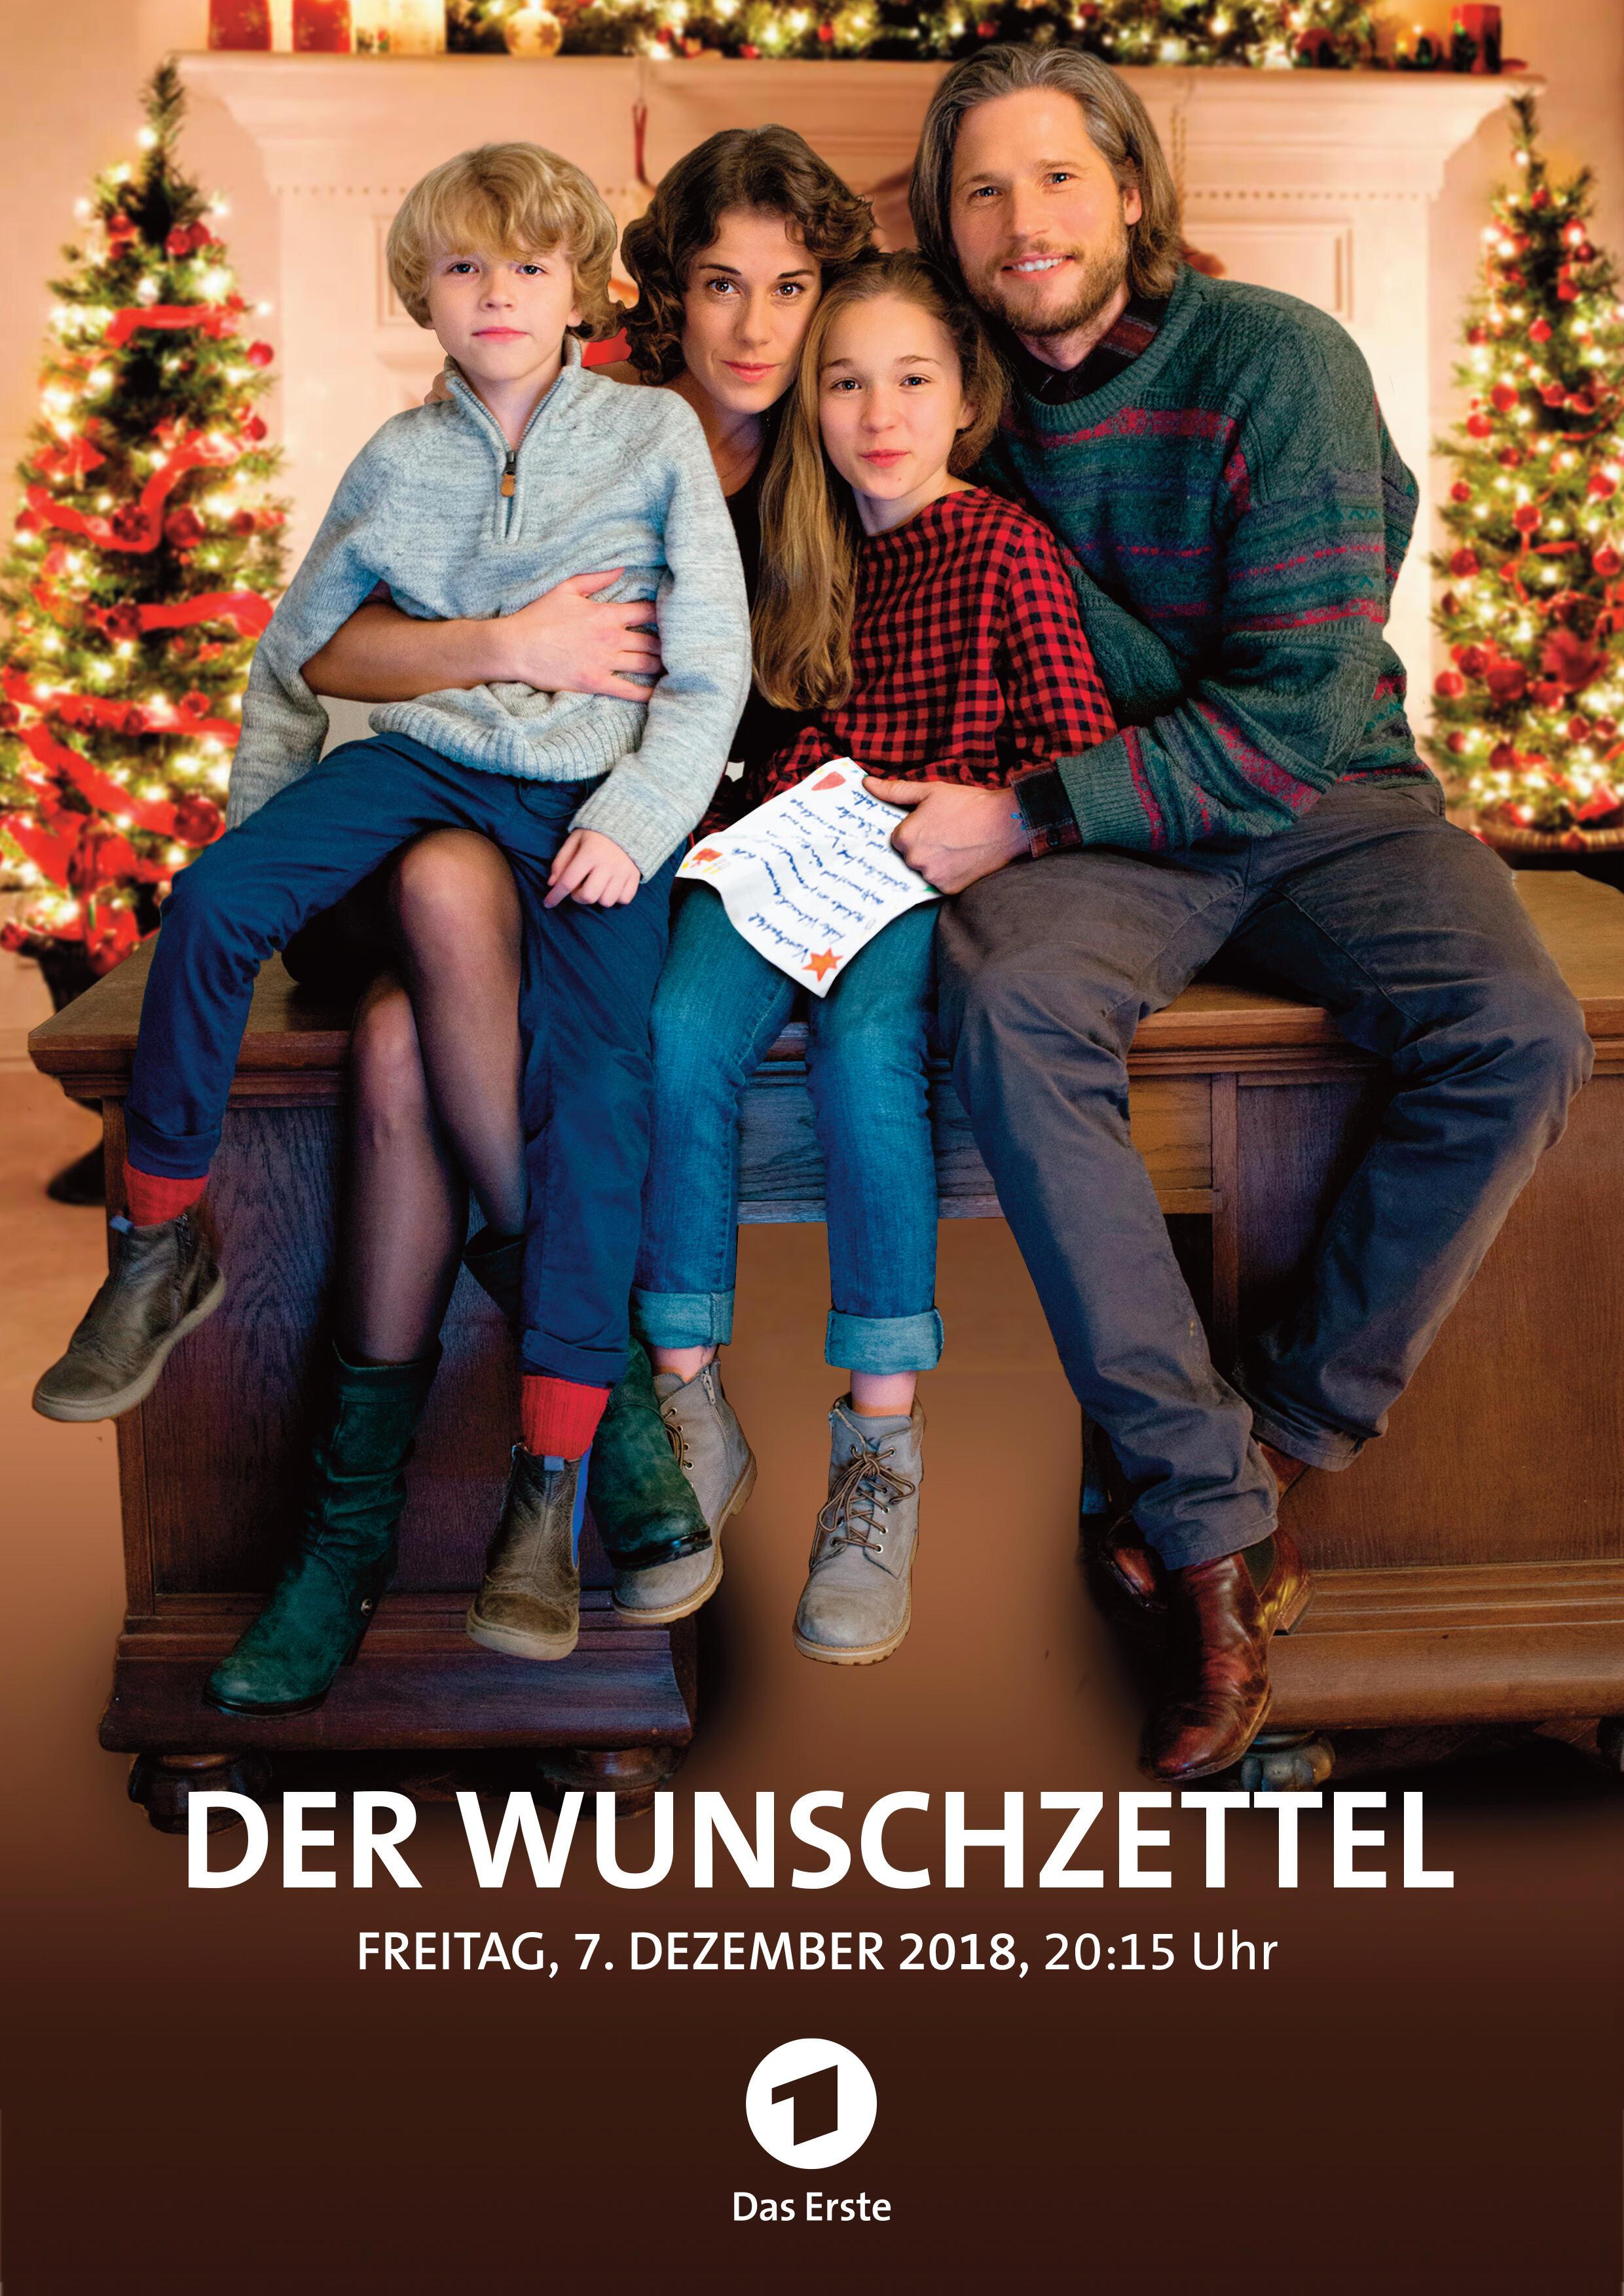 Der Wunschzettel | Film 2018 | moviepilot.de